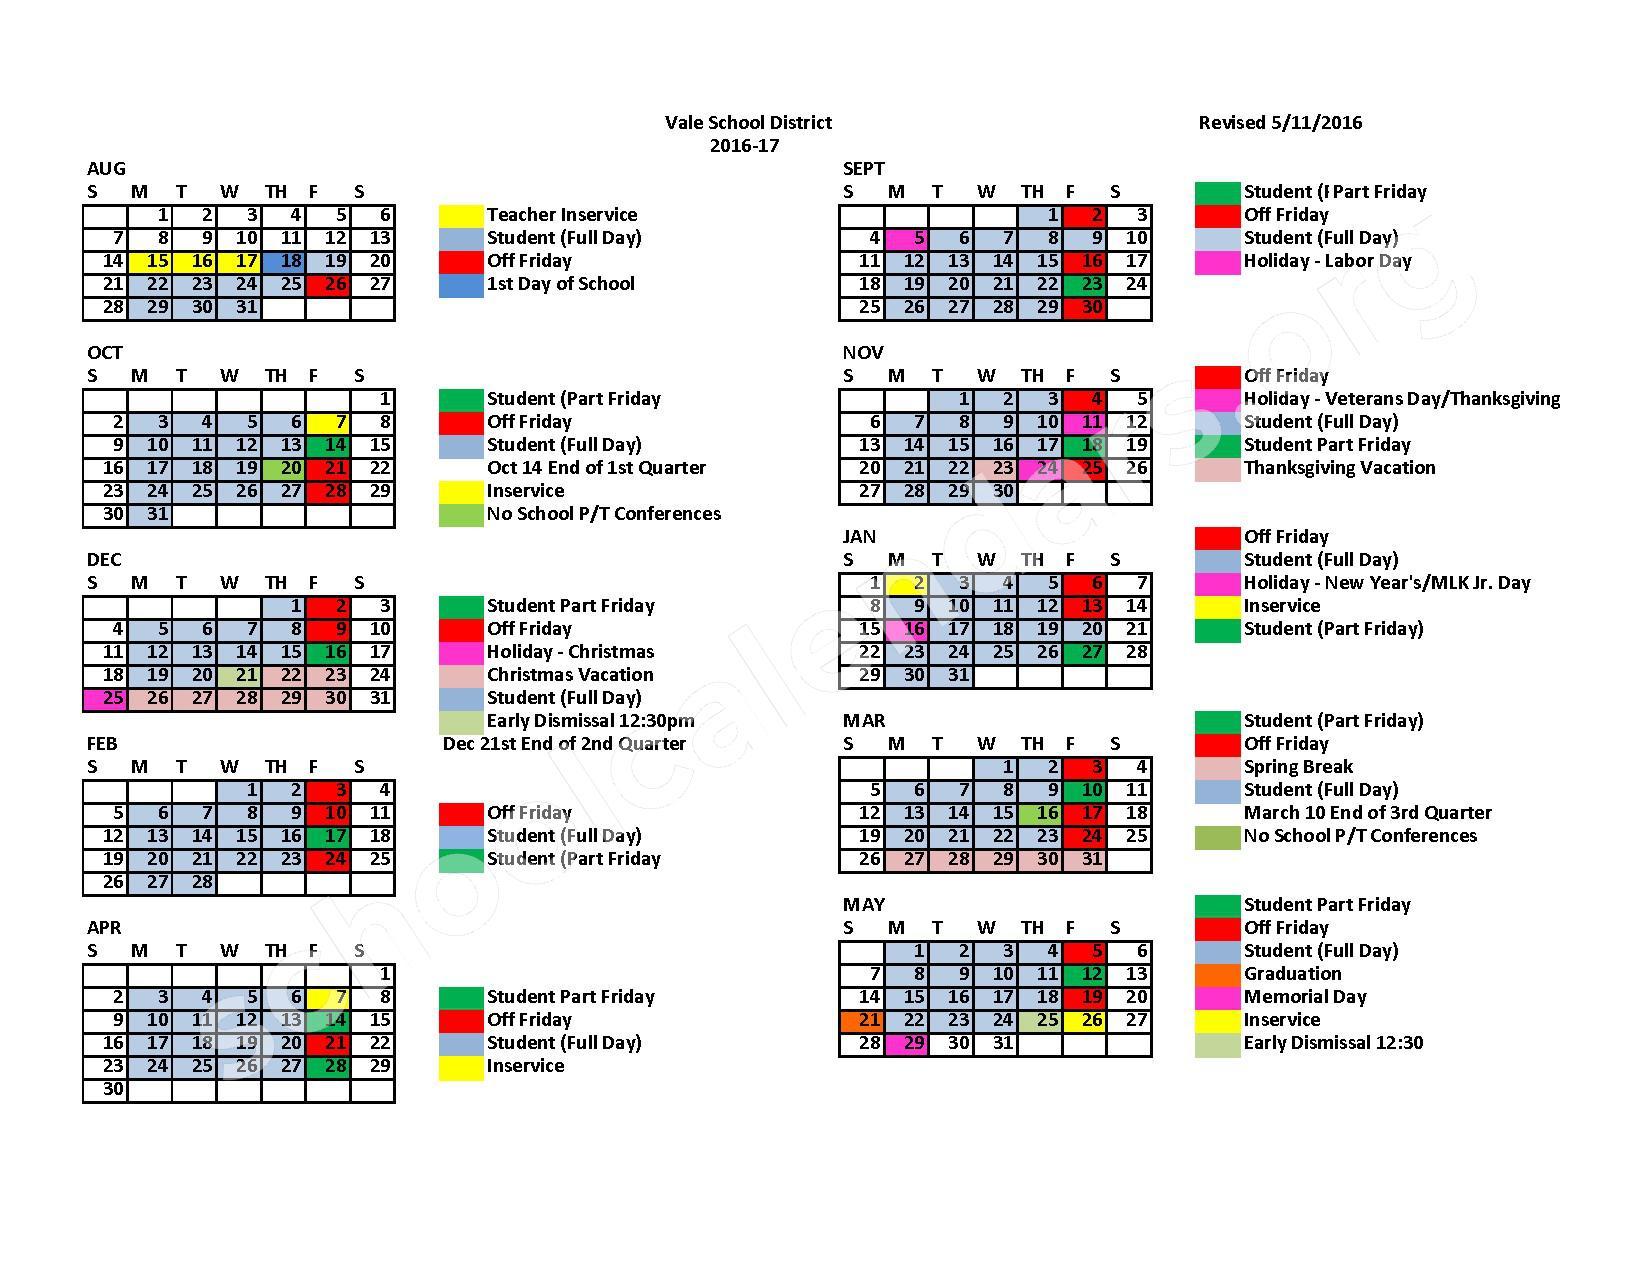 2016 - 2017 School Calendar – Vale School District – page 1